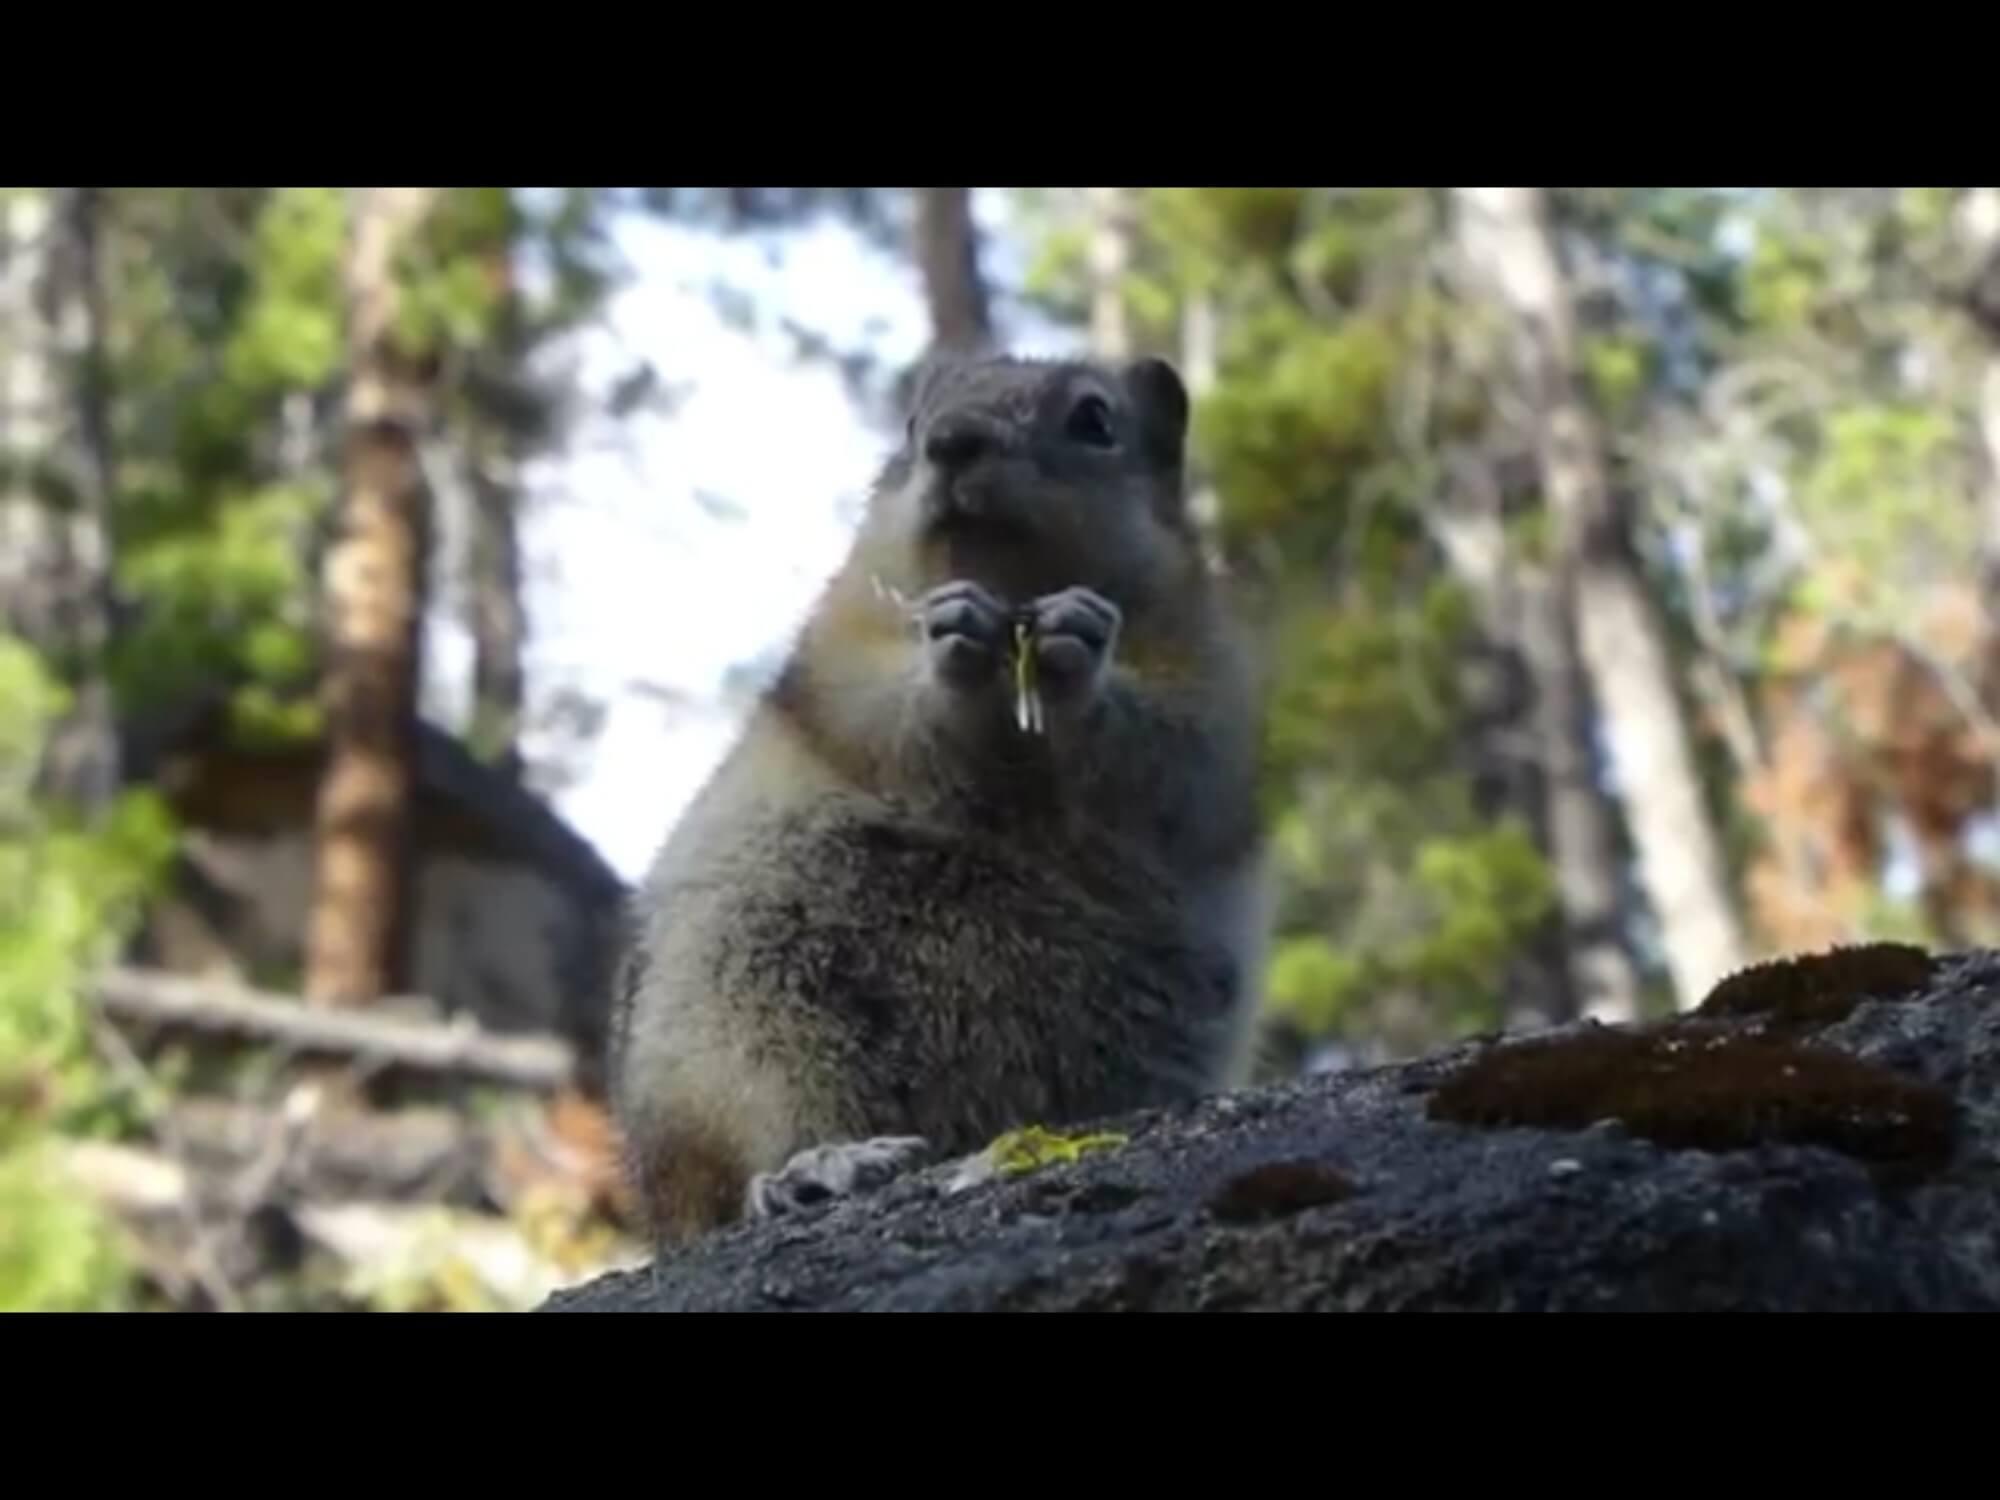 Golden mantled ground squirrel munches on a dandelion. Short video